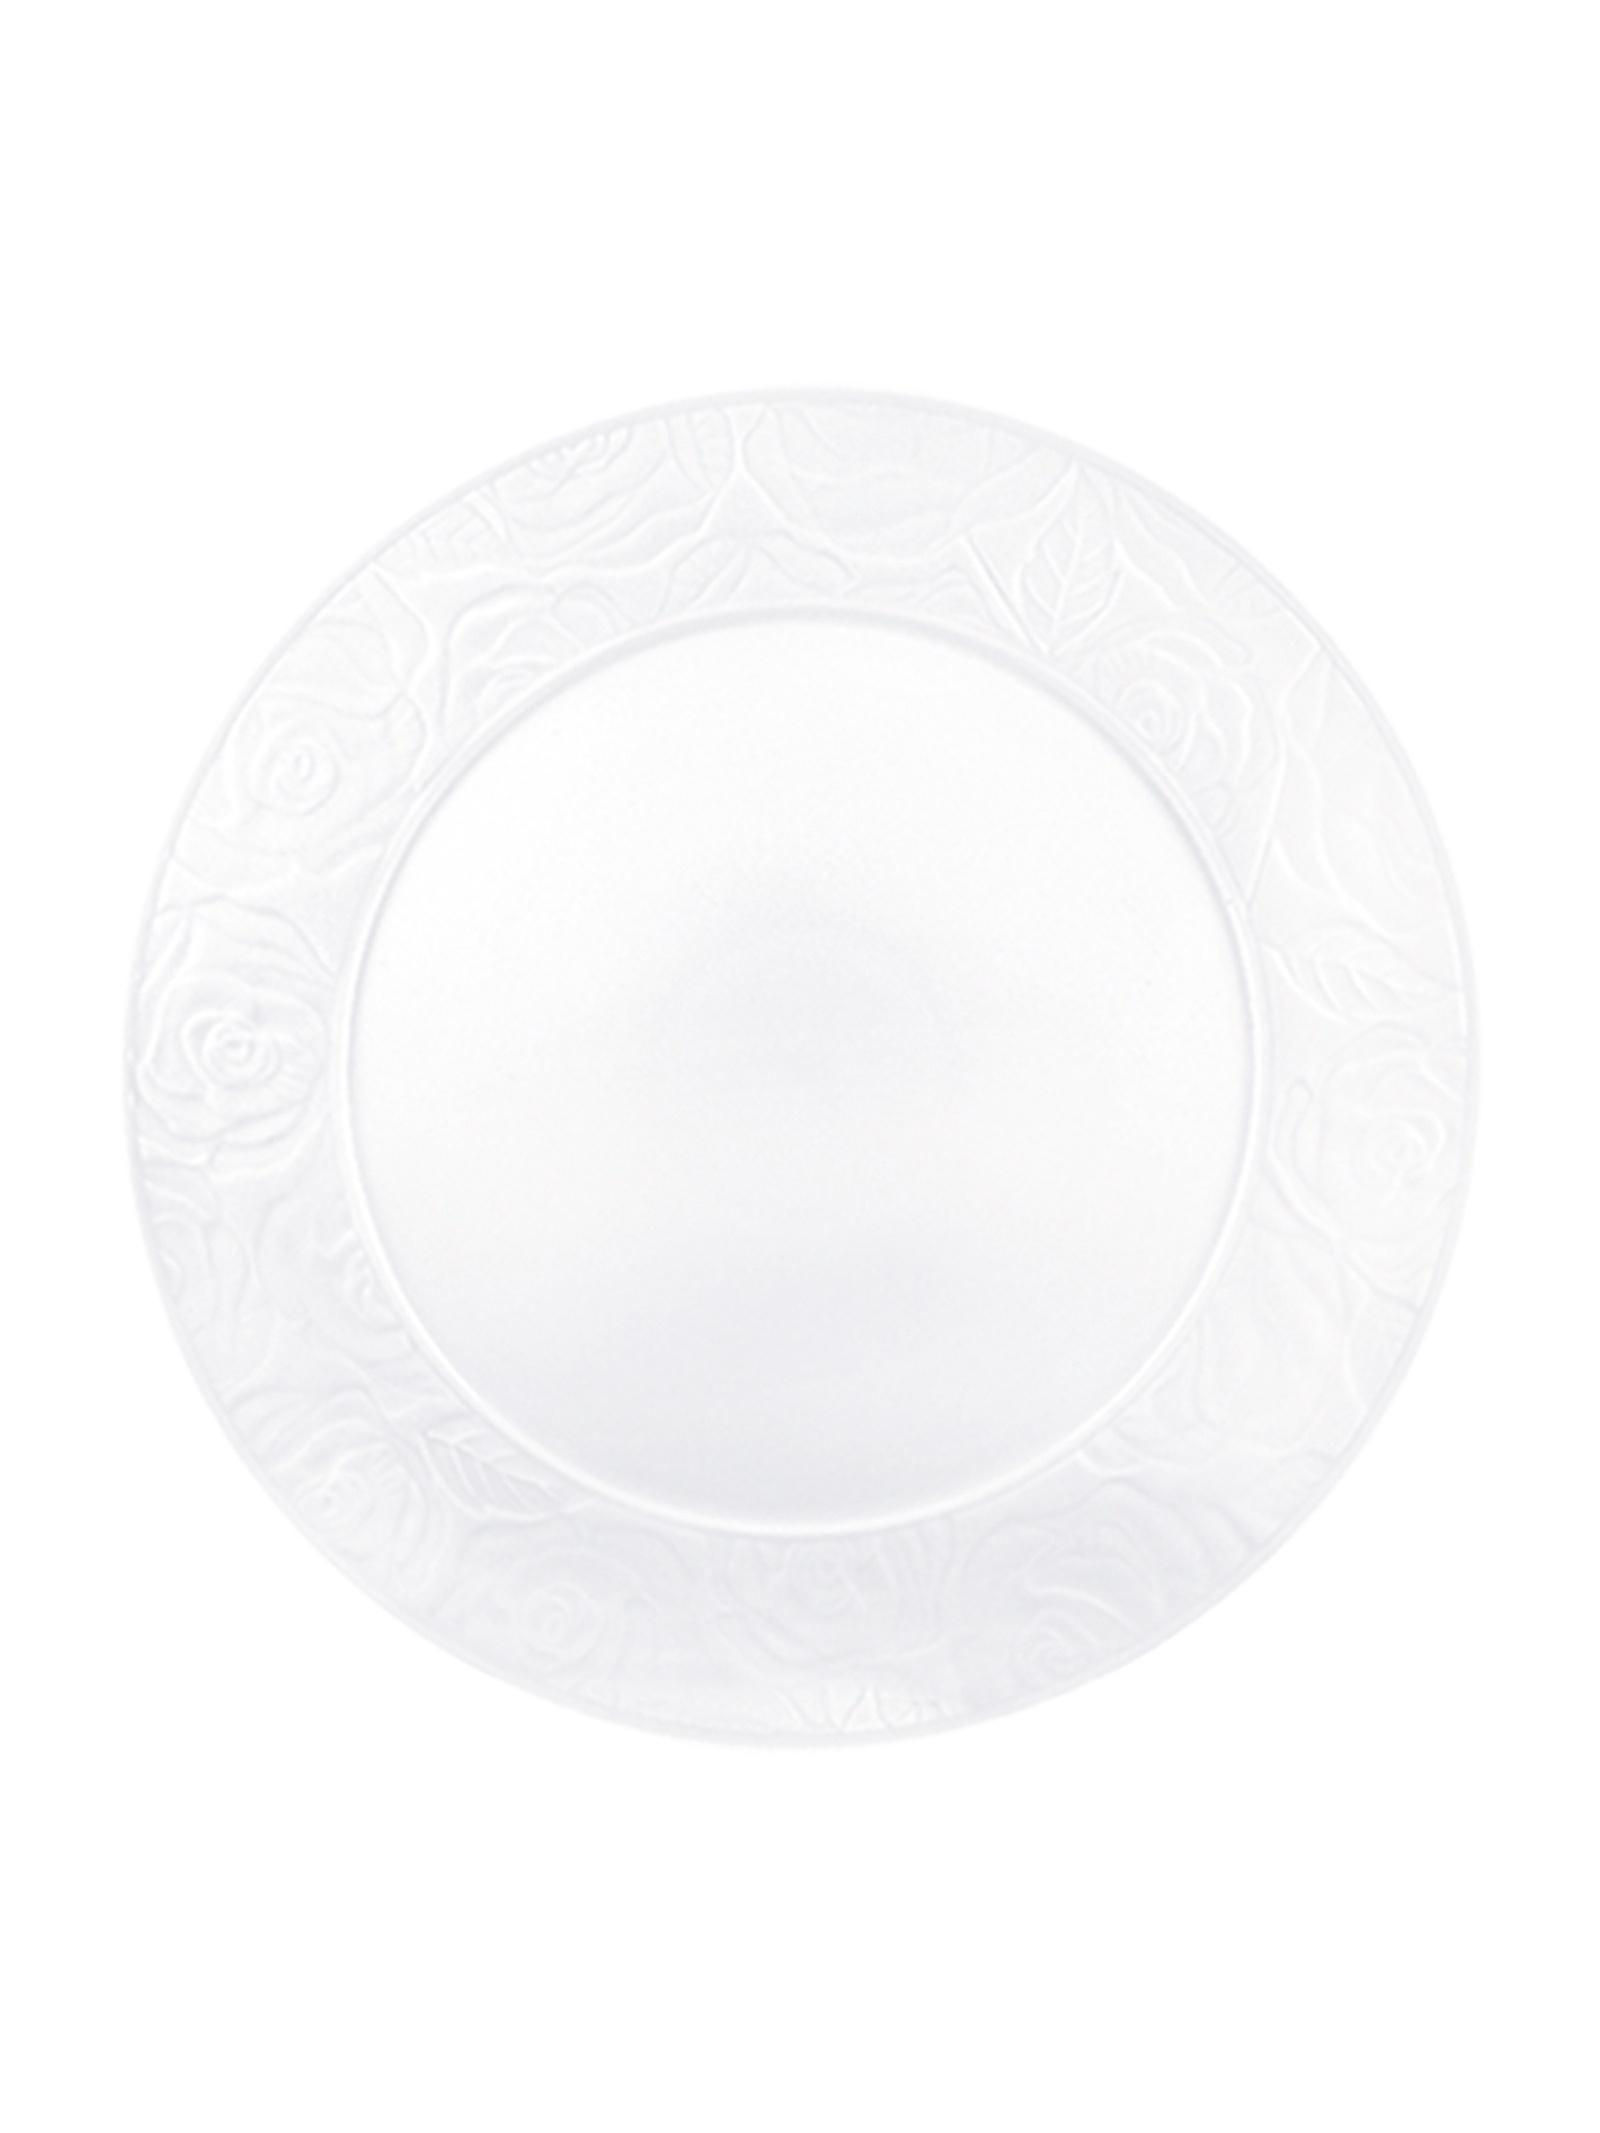 Тарелка десертная Коралл 949991, Керамика тарелка десертная ломоносовская керамика диаметр 21 см